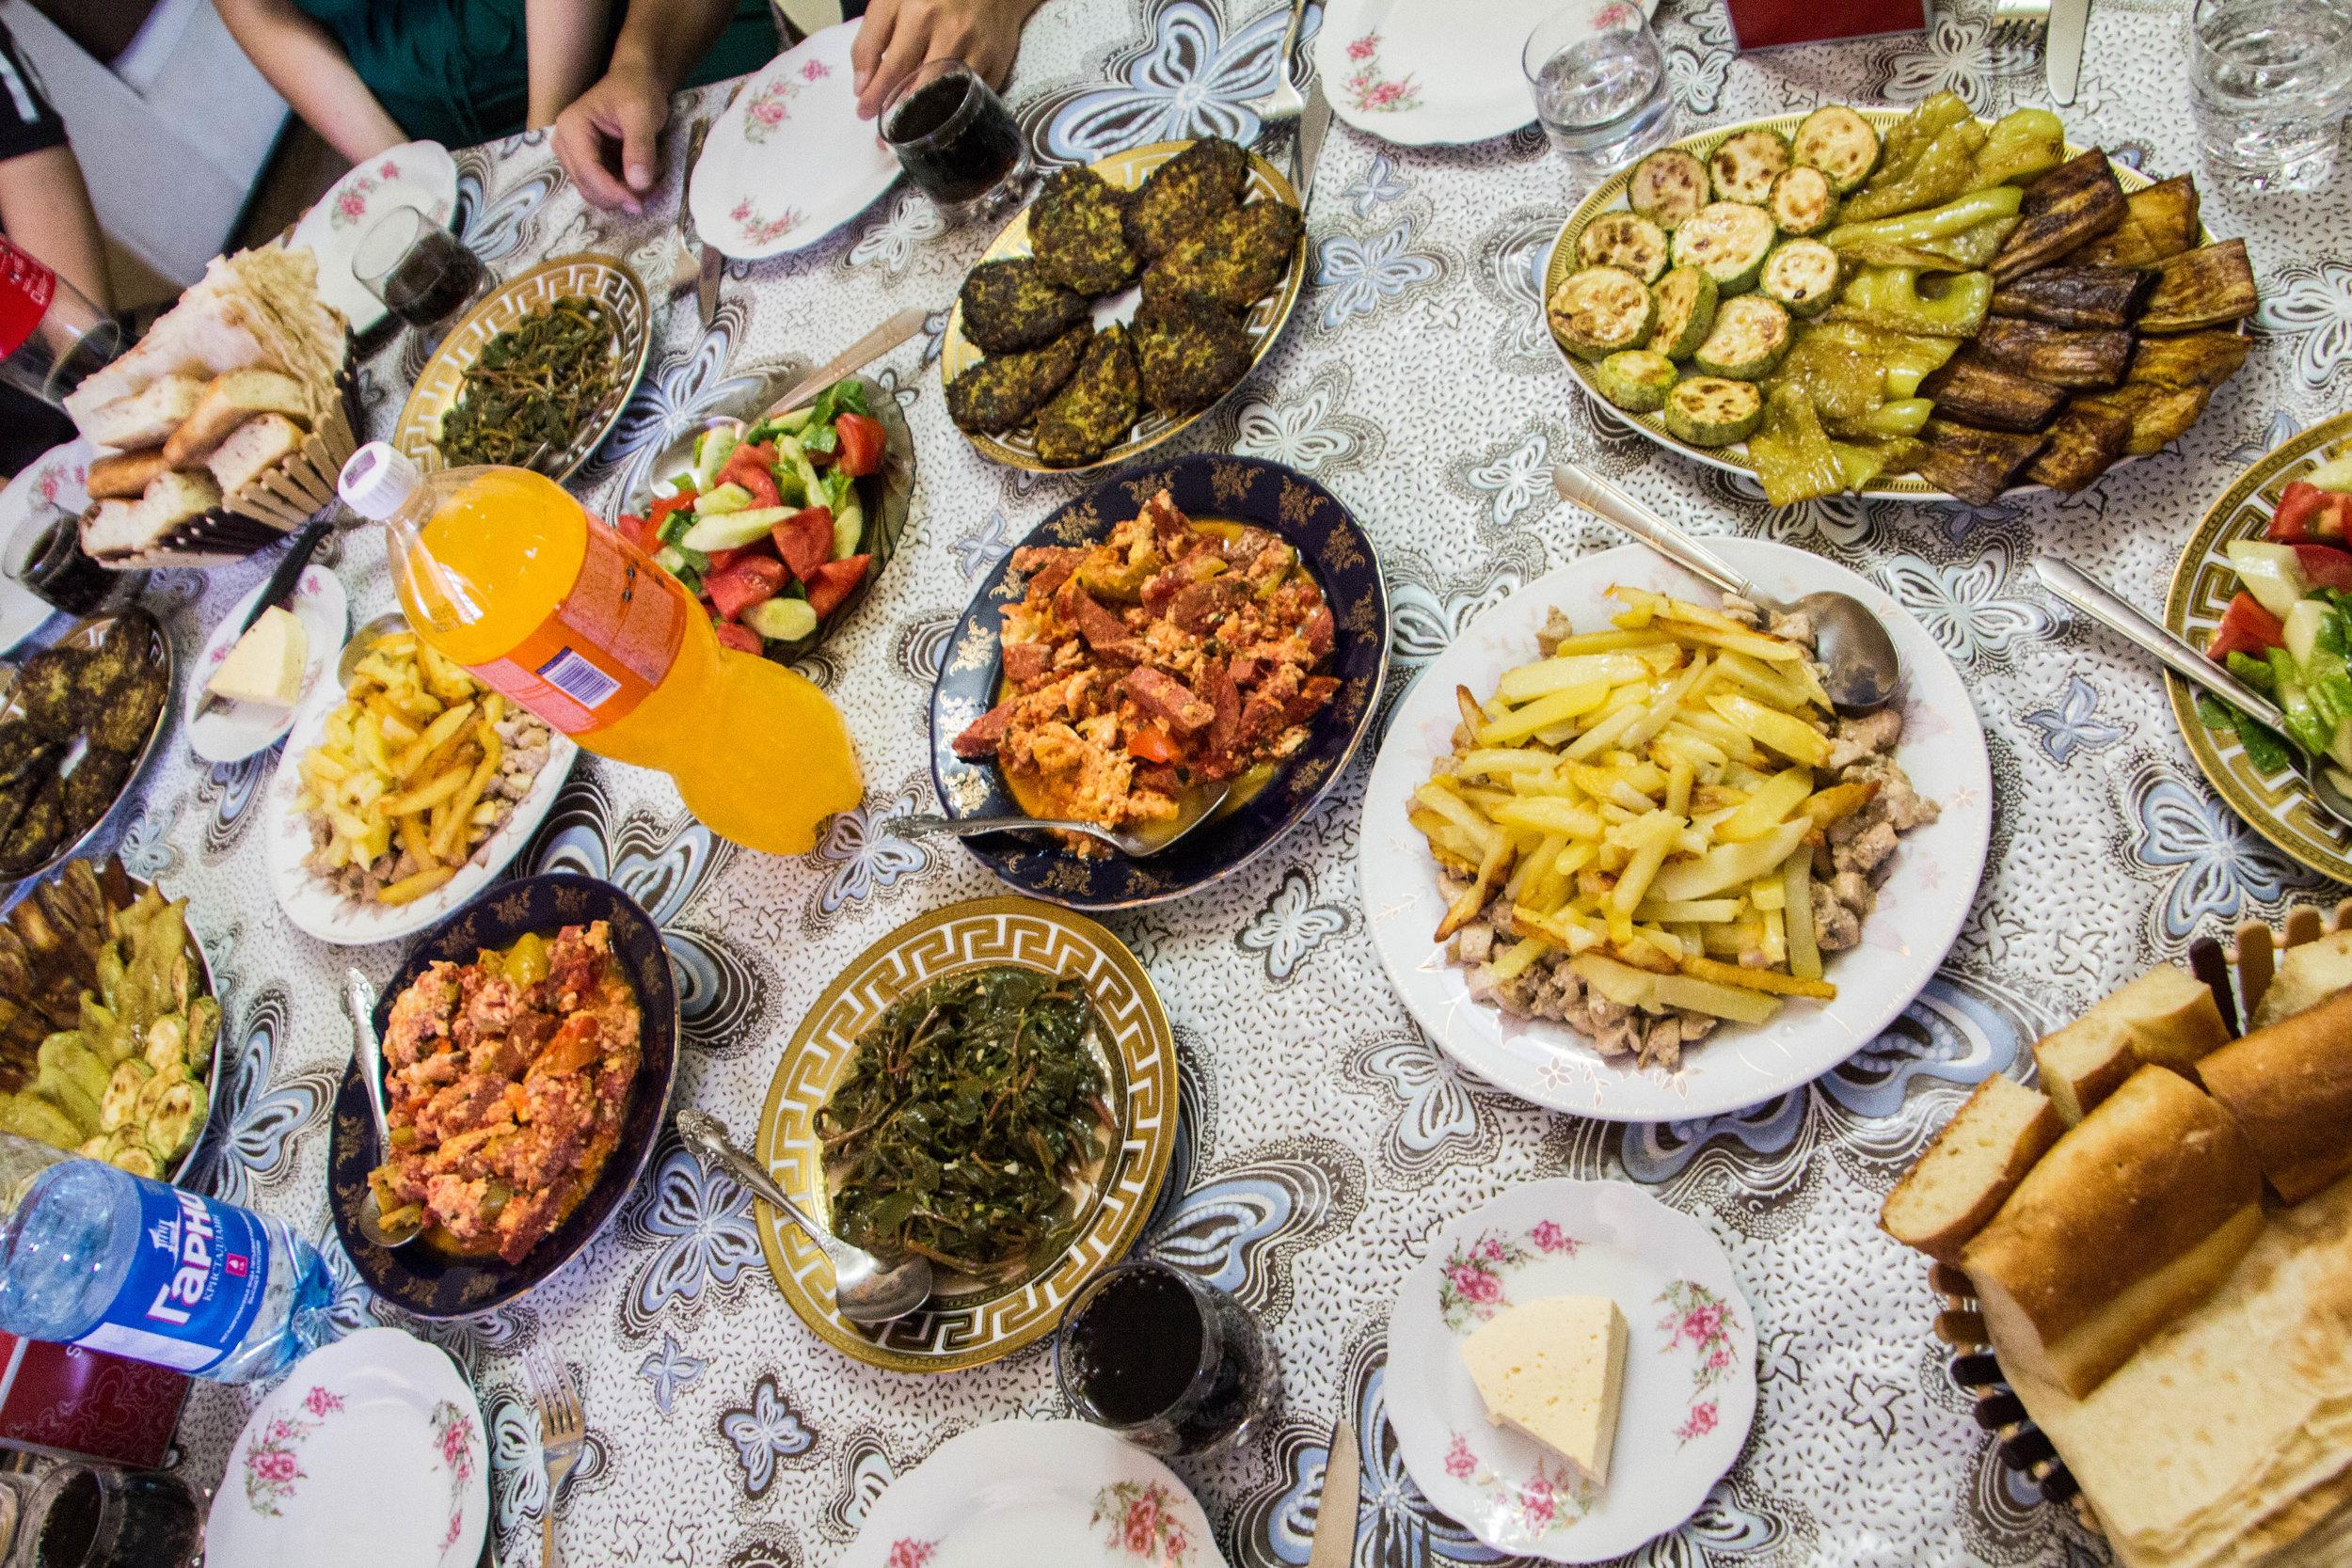 armenian-food.jpg